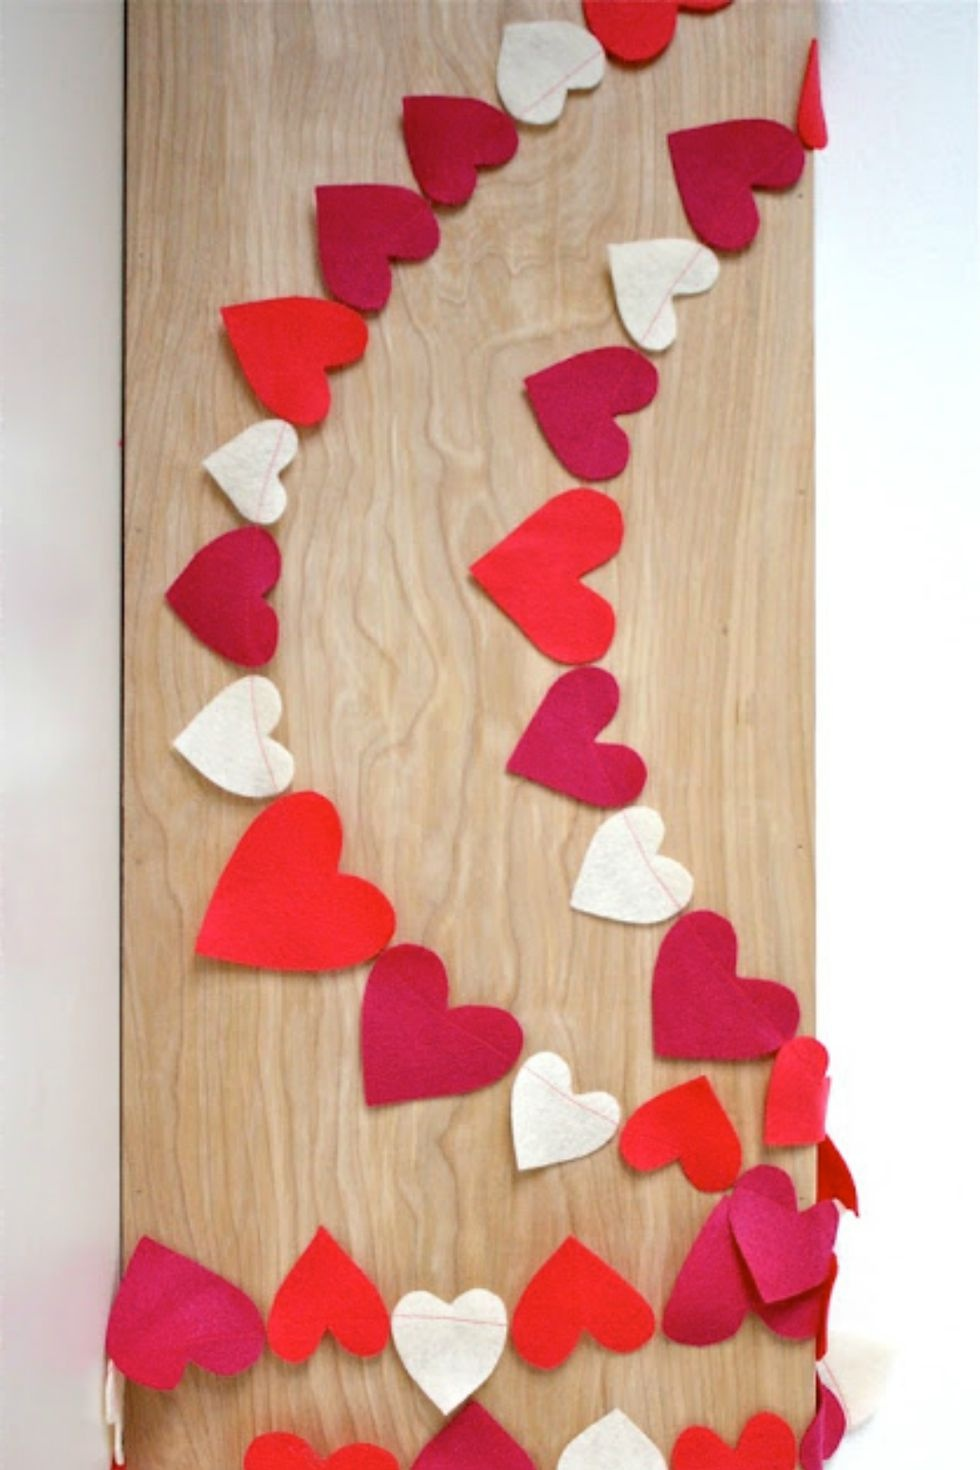 1481813567-heart-garland-